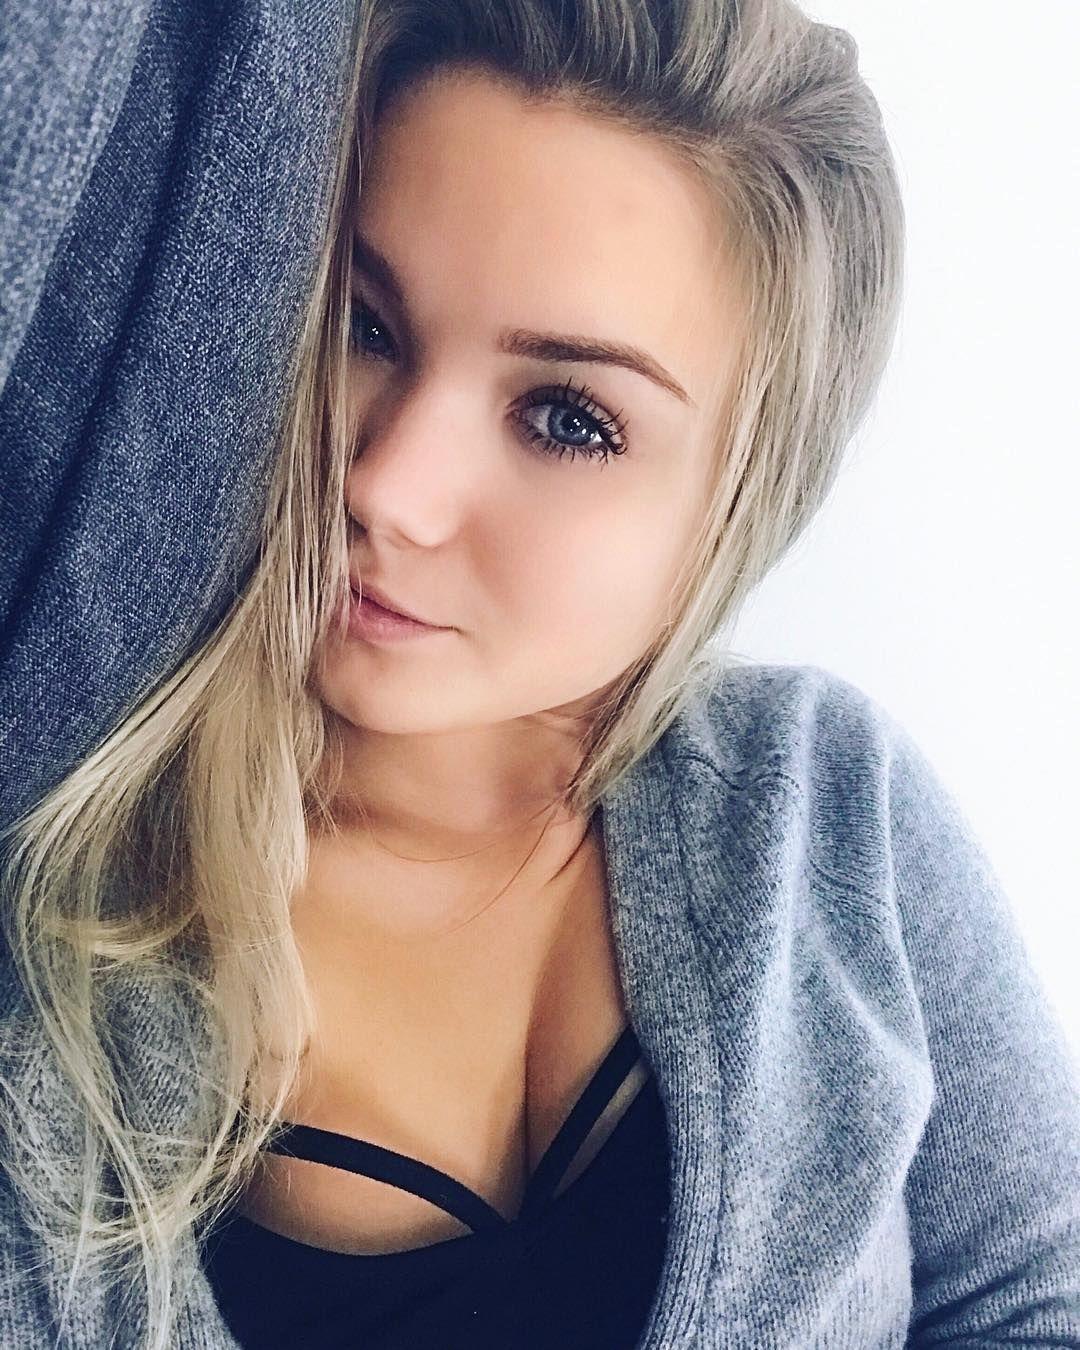 Julia beautx bikini